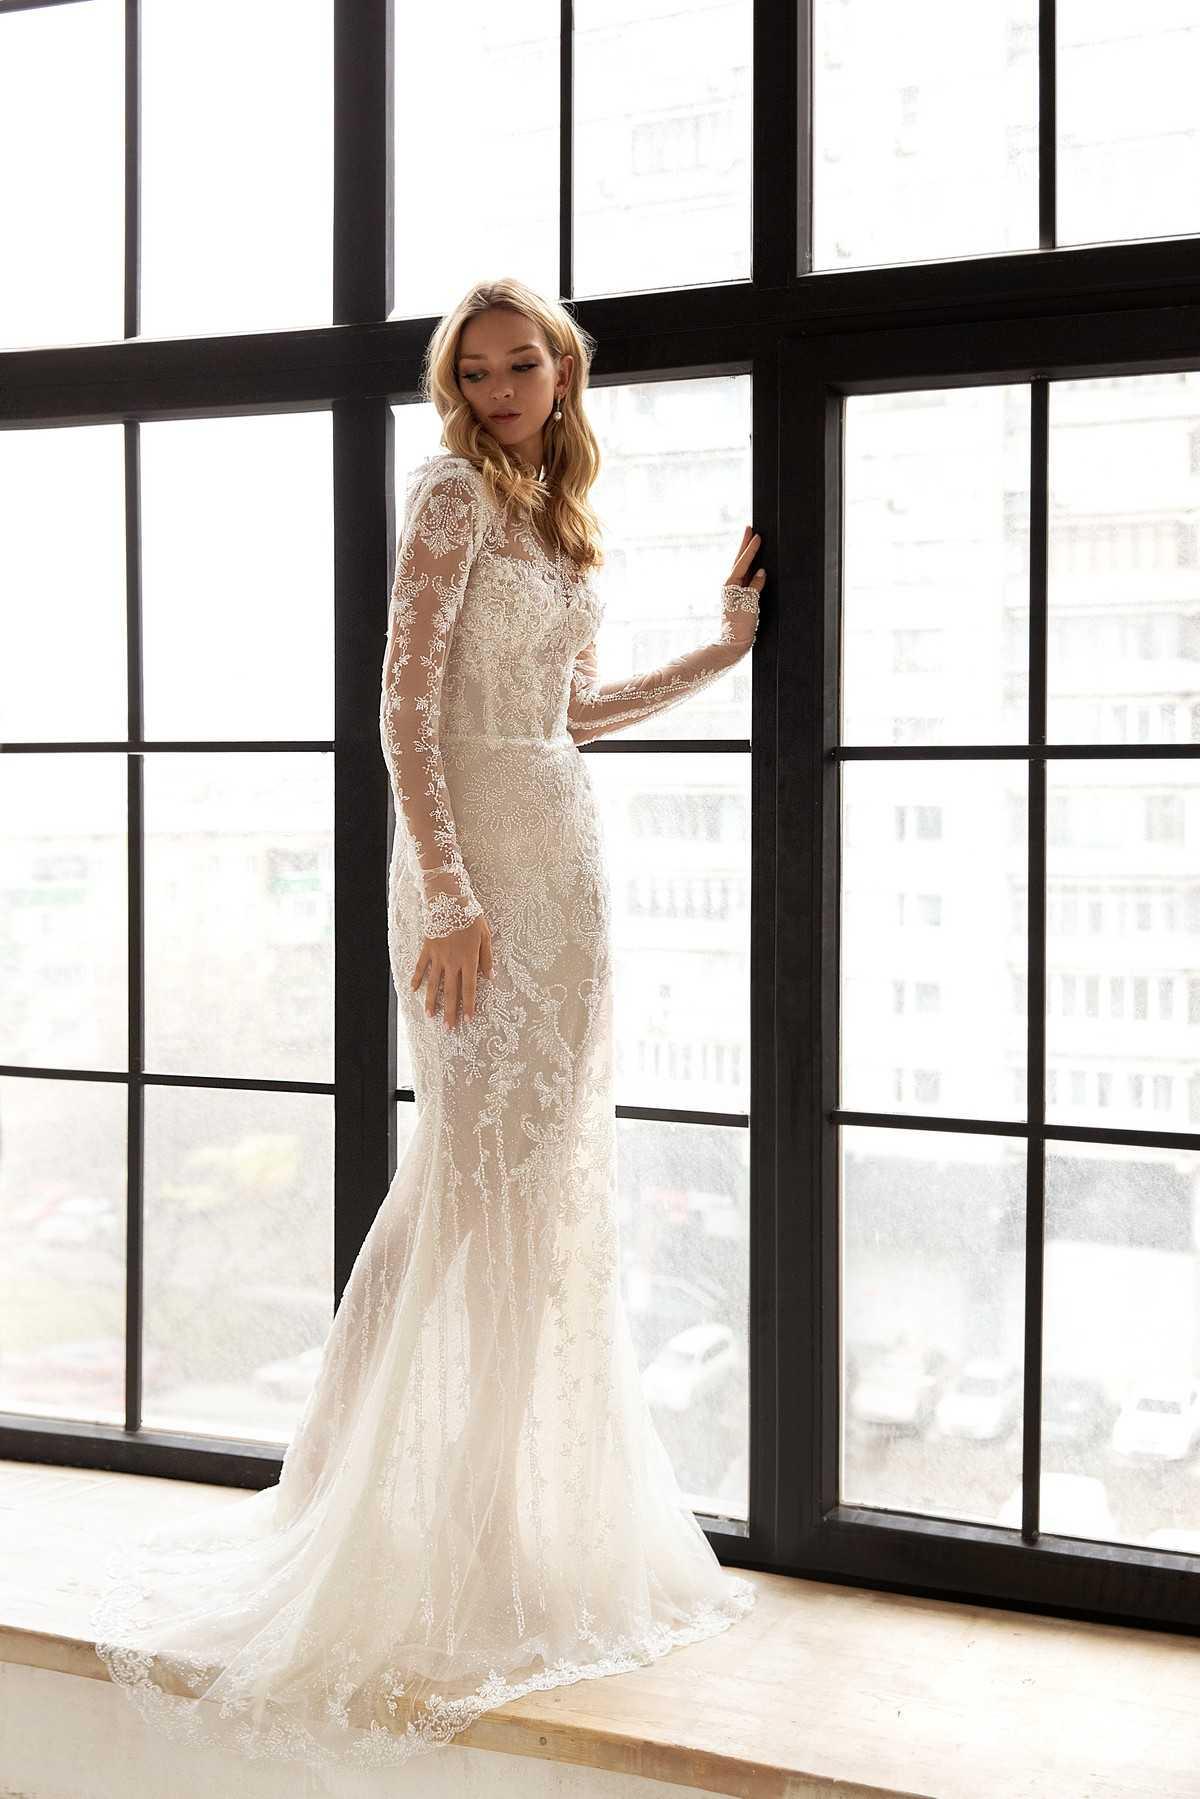 Celine Новая свадебная коллекция Less is more бренда Eva Lendel